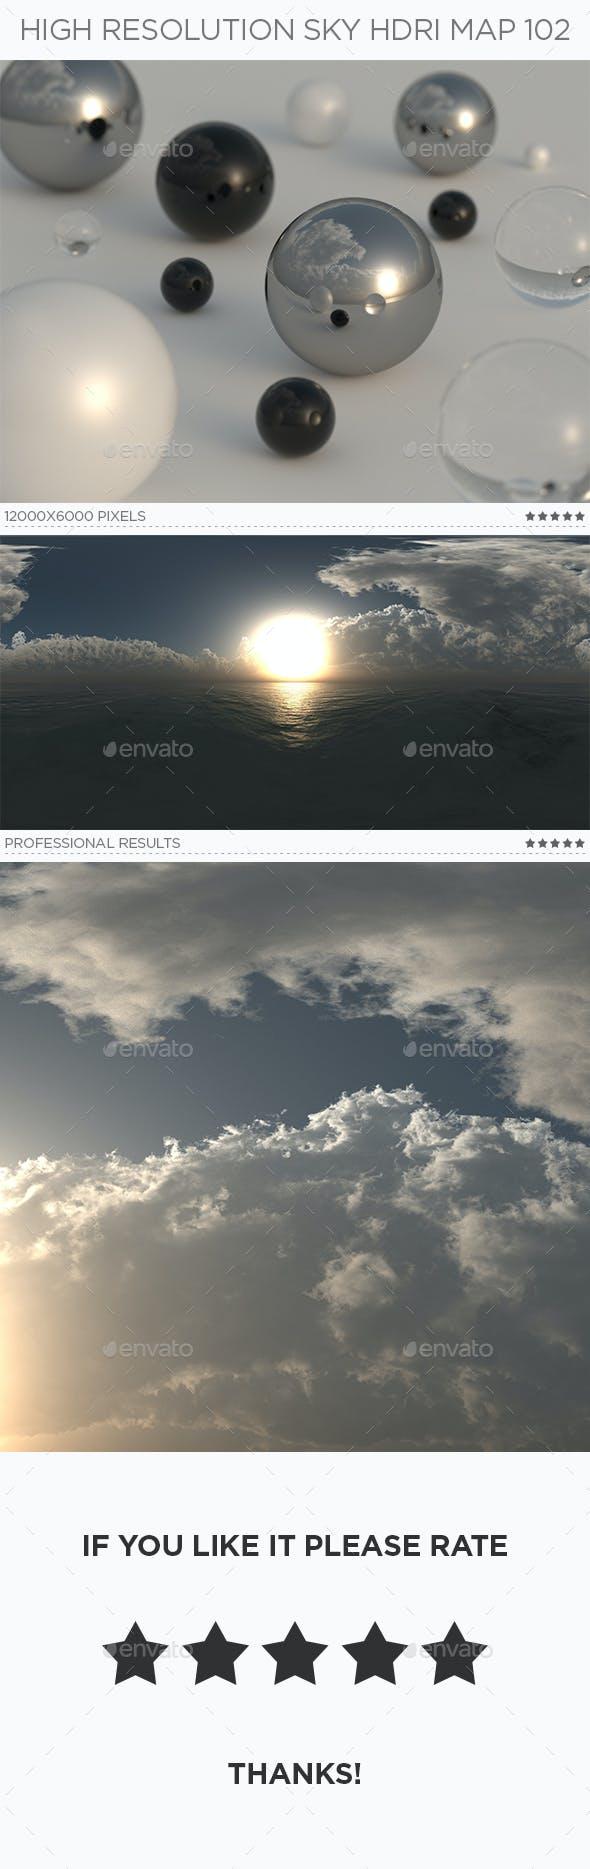 High Resolution Sky HDRi Map 102 - 3DOcean Item for Sale